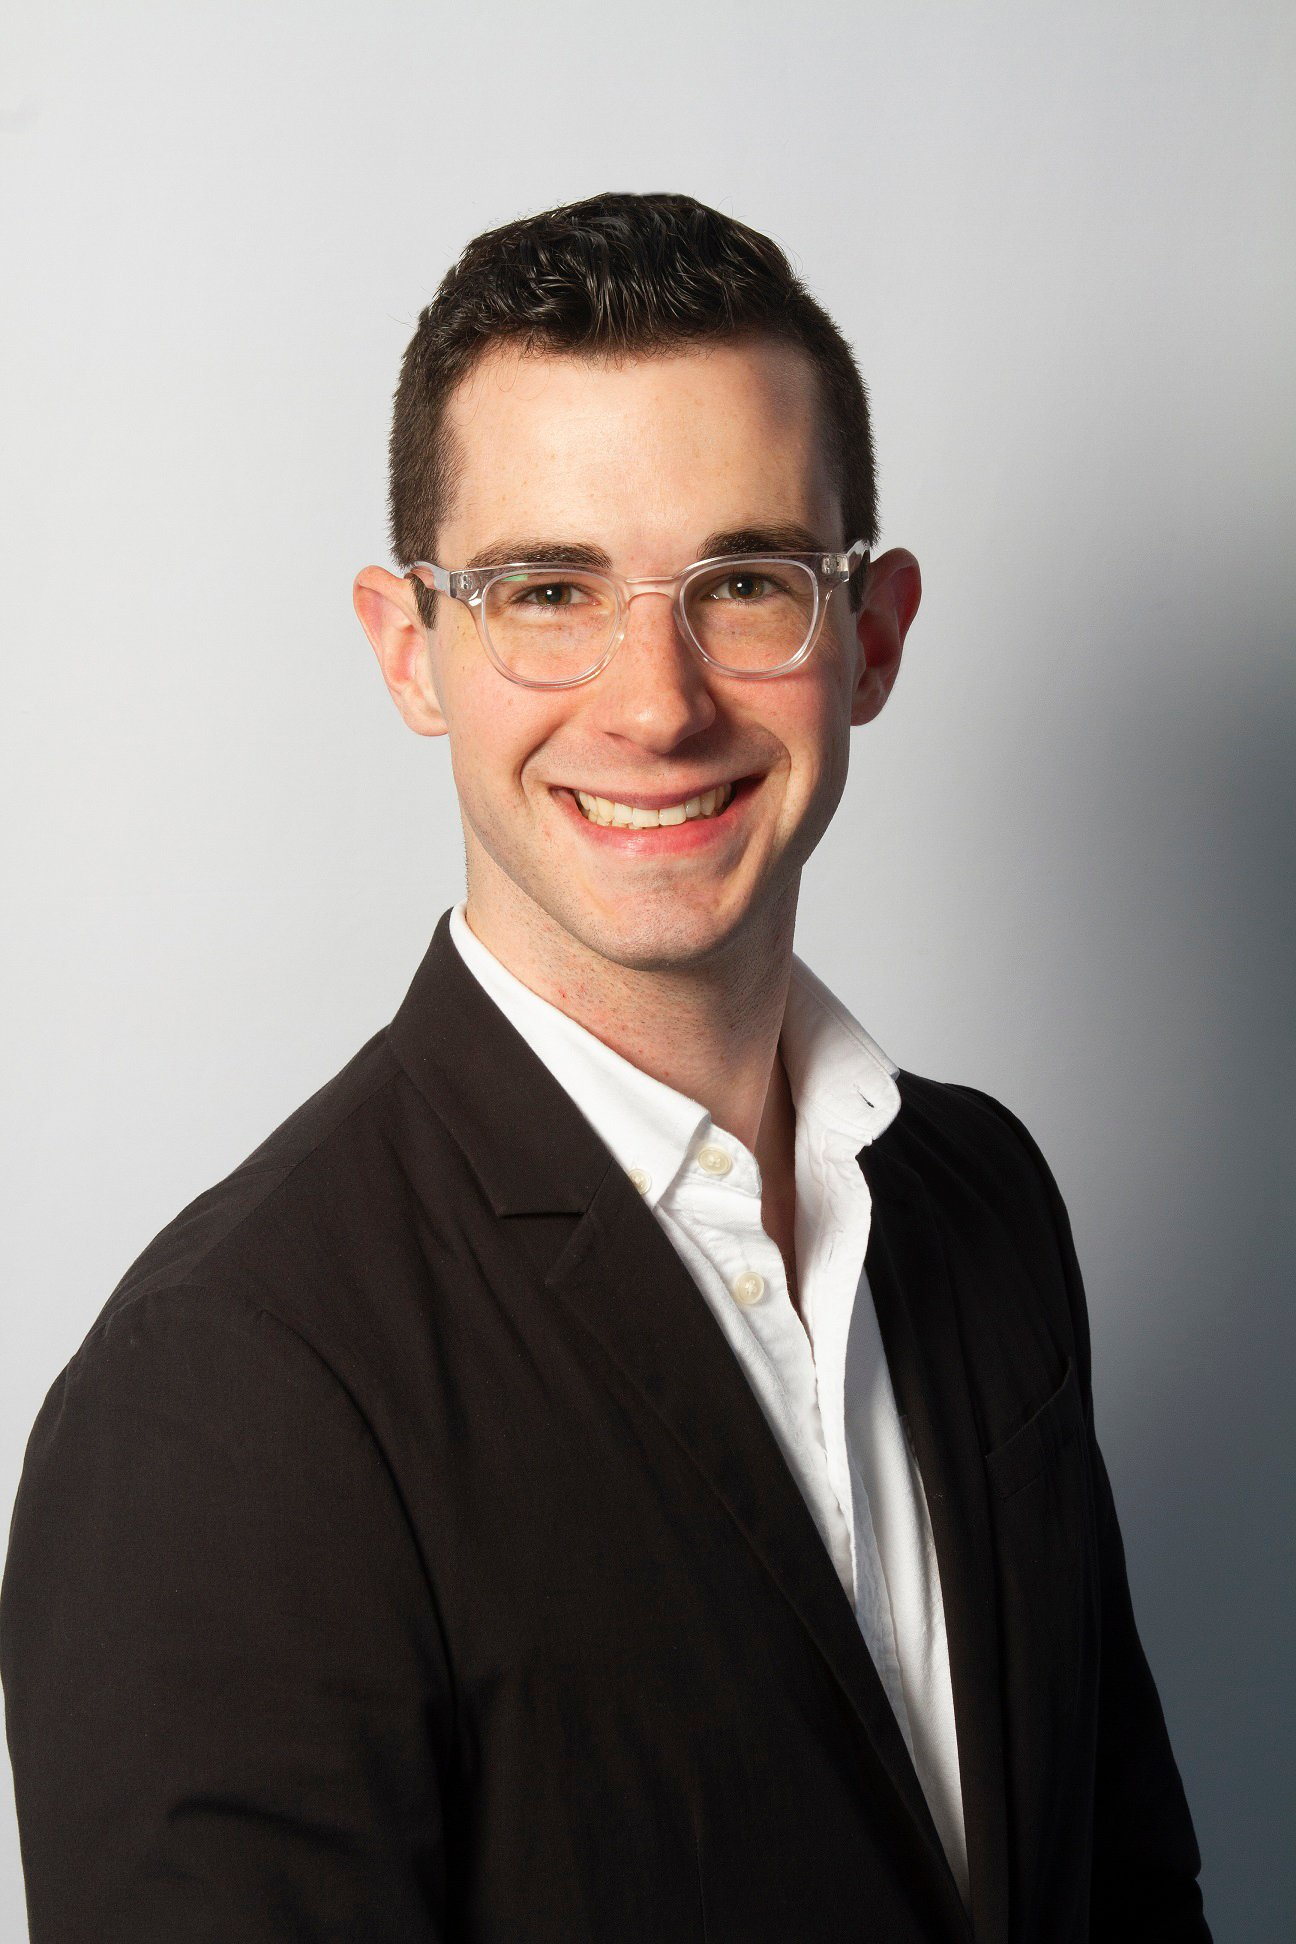 Cameron Bowman